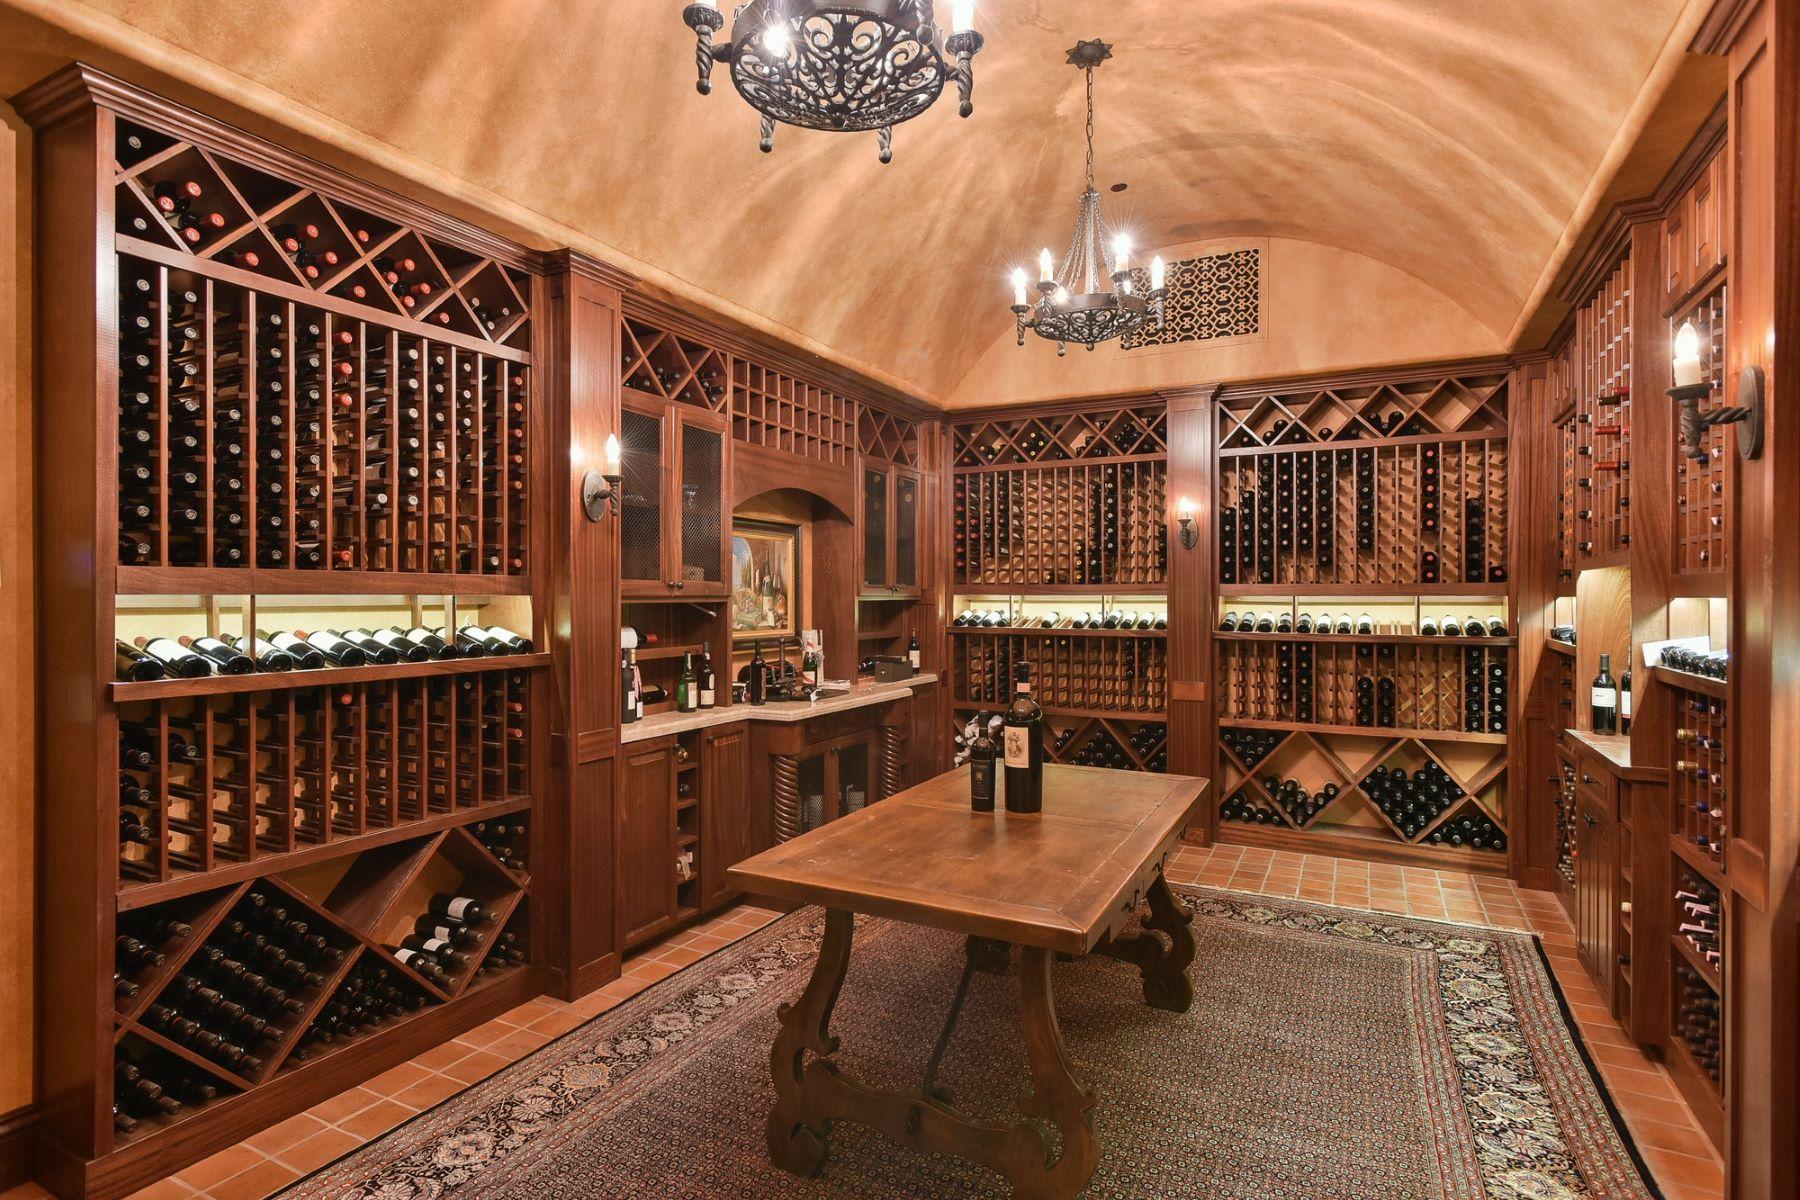 Additional photo for property listing at 6020 El Camino Del Norte Rancho Santa Fe, California 92067 United States